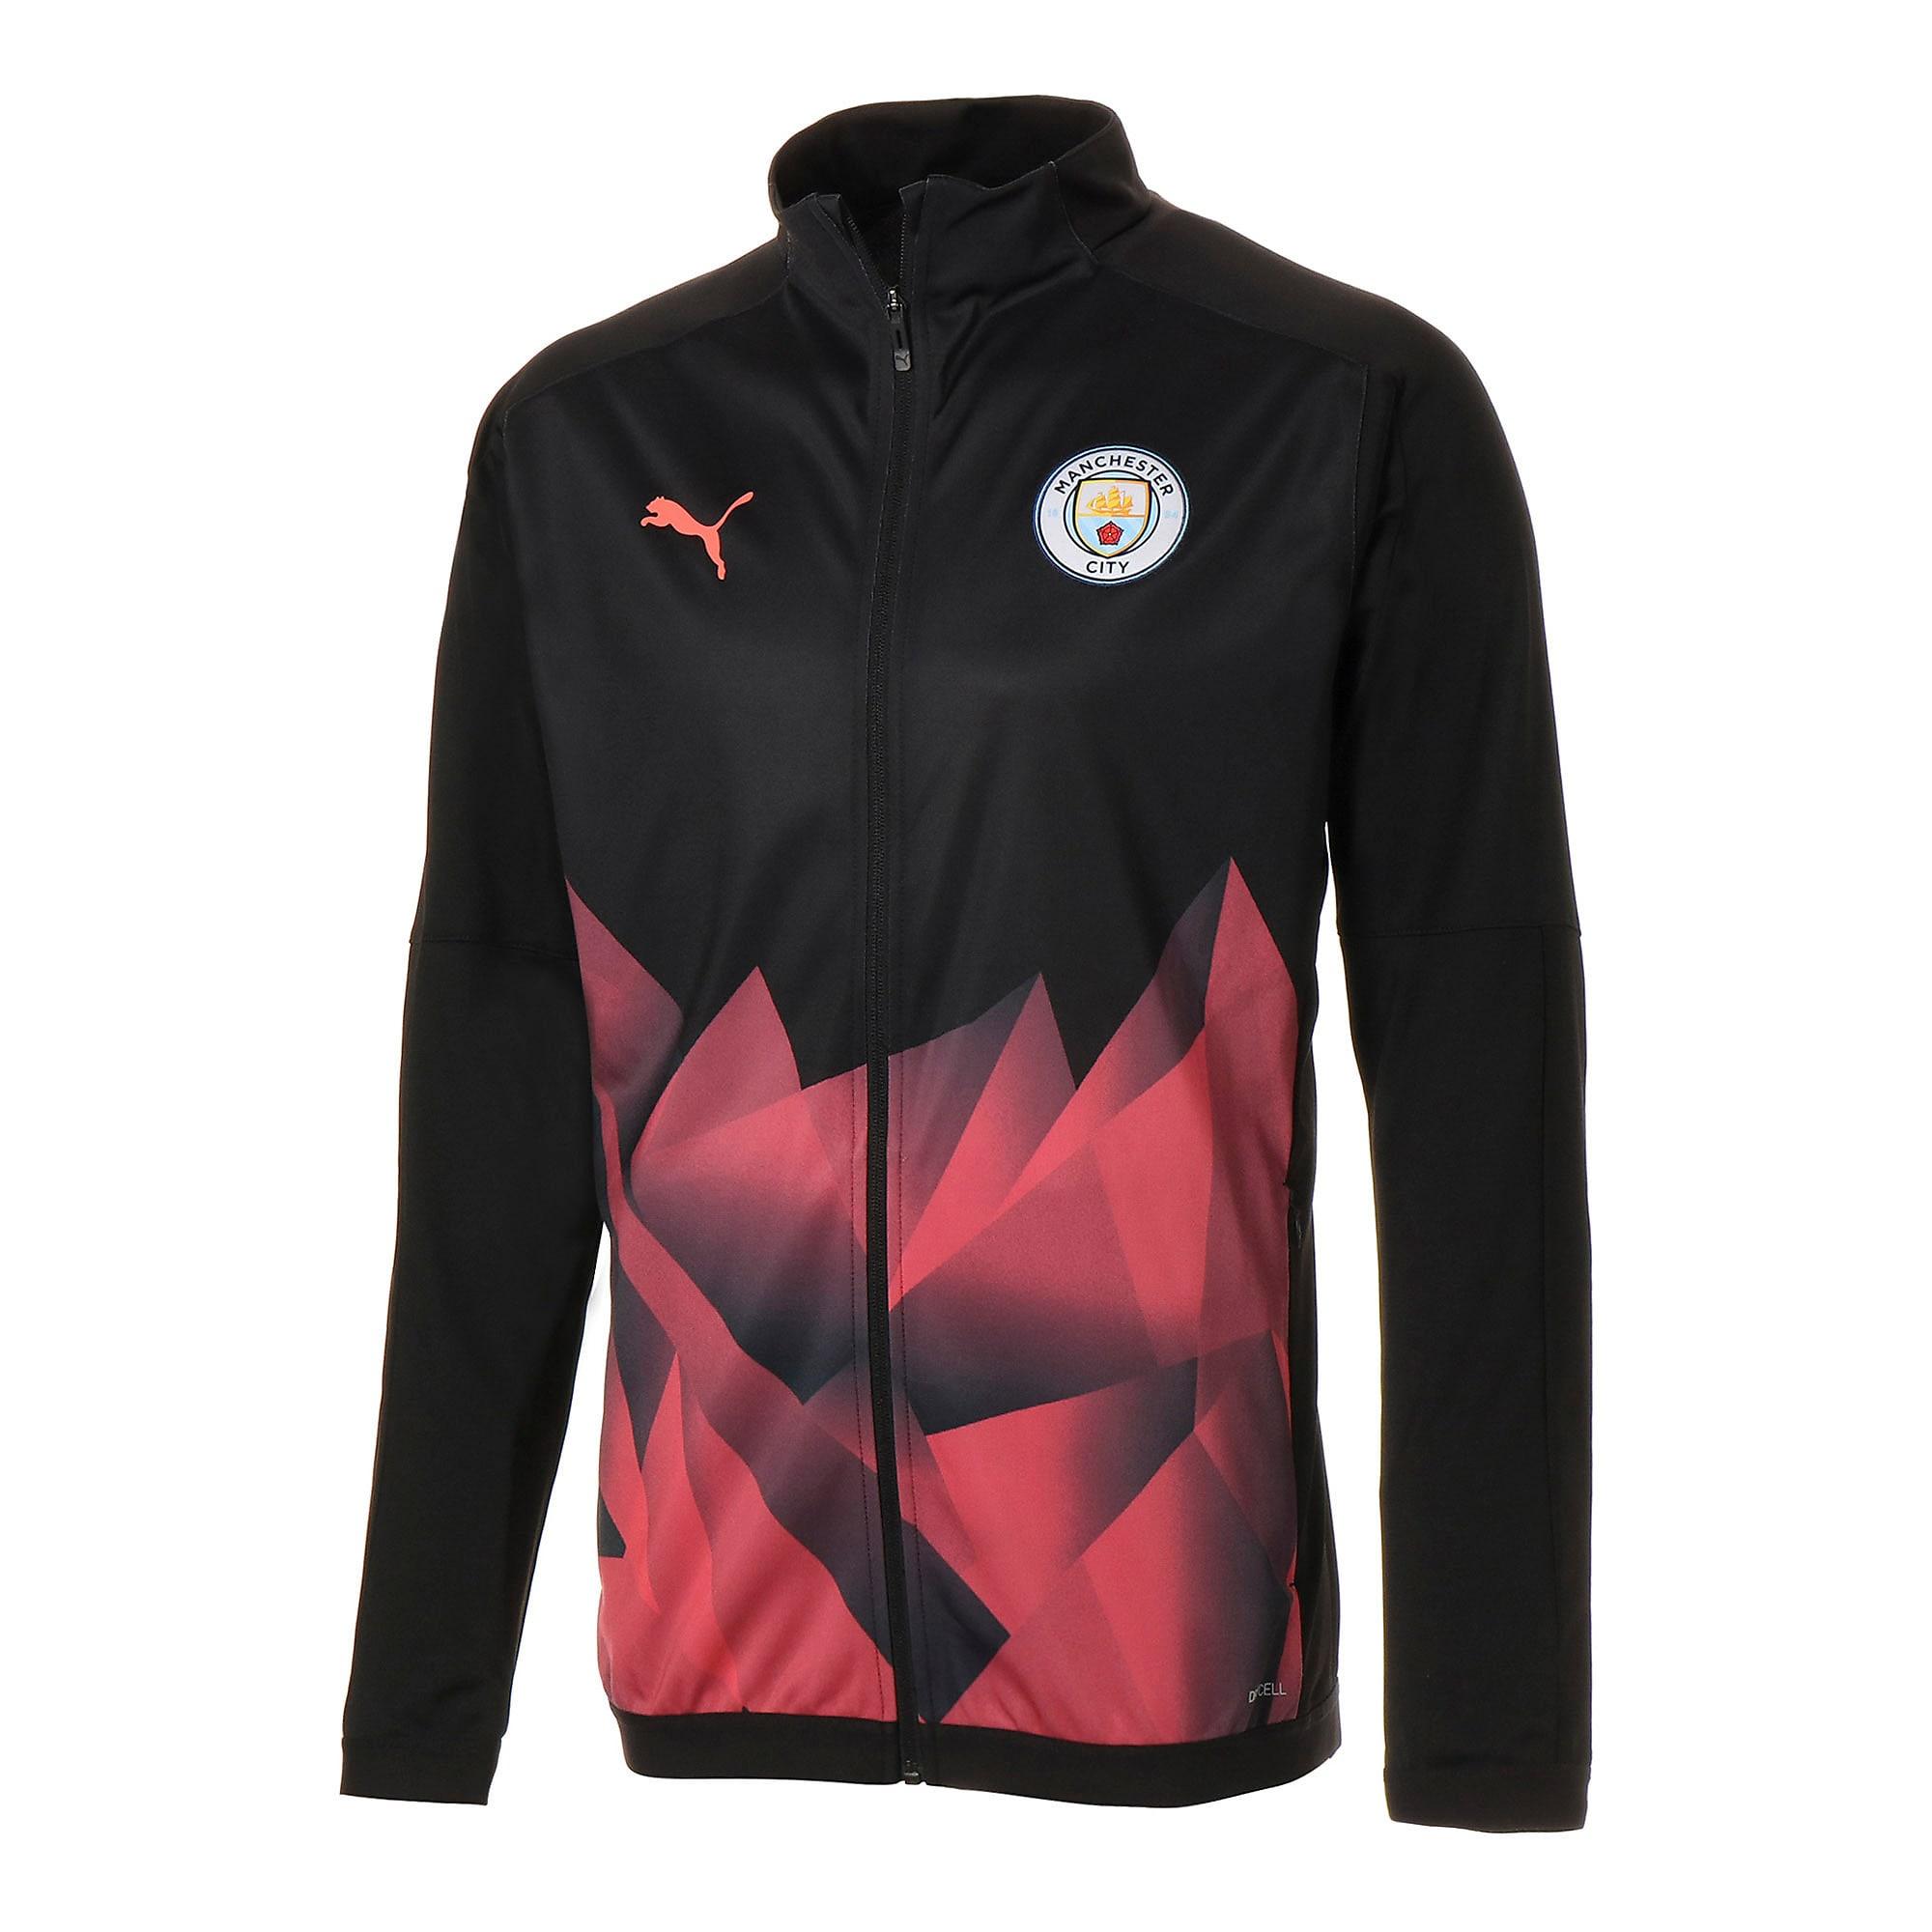 Thumbnail 1 of Man City Men's International Stadium Jacket, Puma Black-Georgia Peach, medium